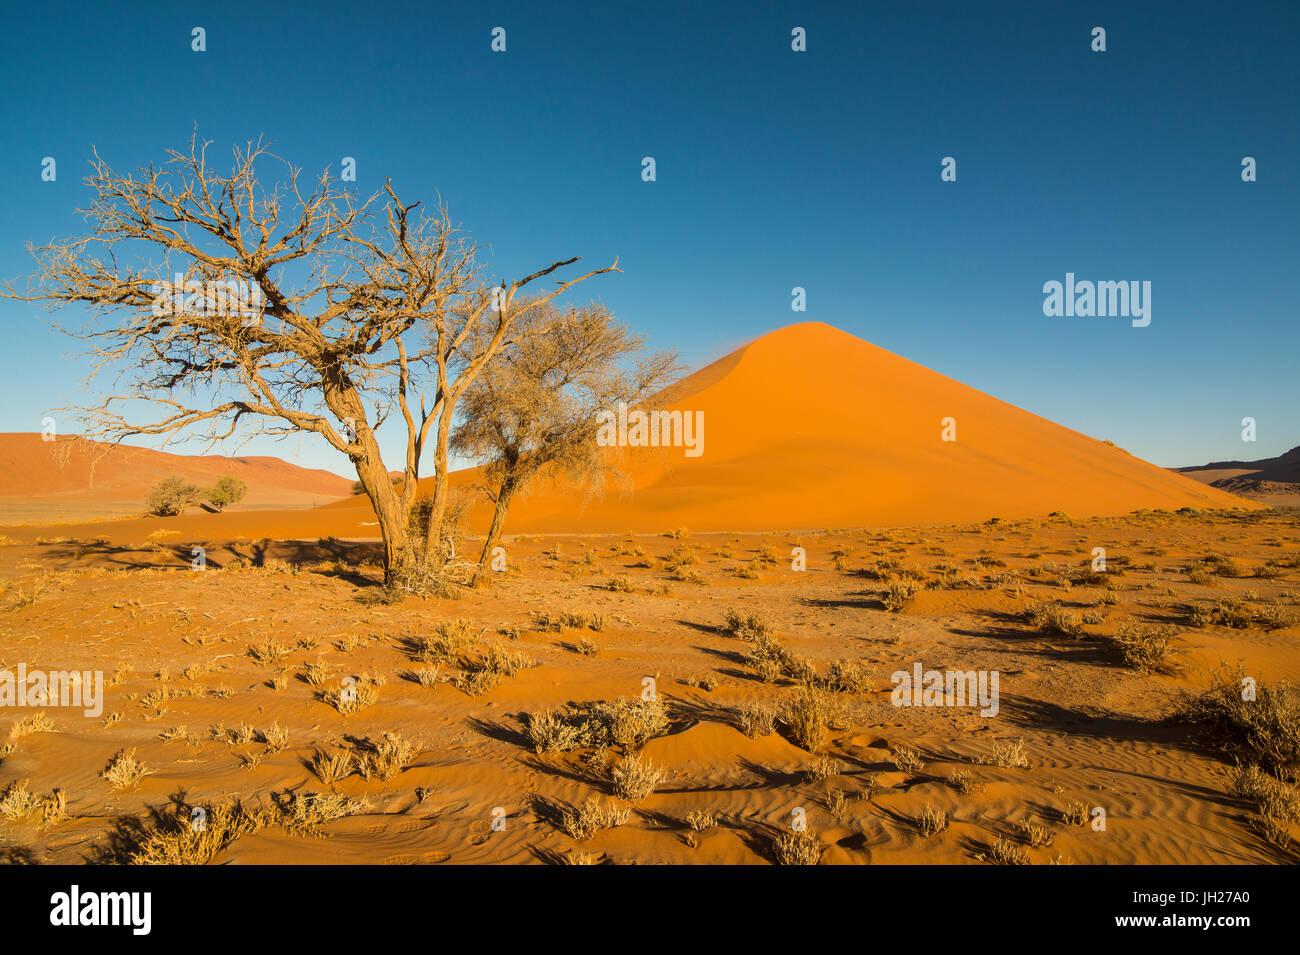 Acacia nella parte anteriore del gigante duna di sabbia 45, Sossusvlei, Namib-Naukluft National Park, Namibia, Africa Foto Stock